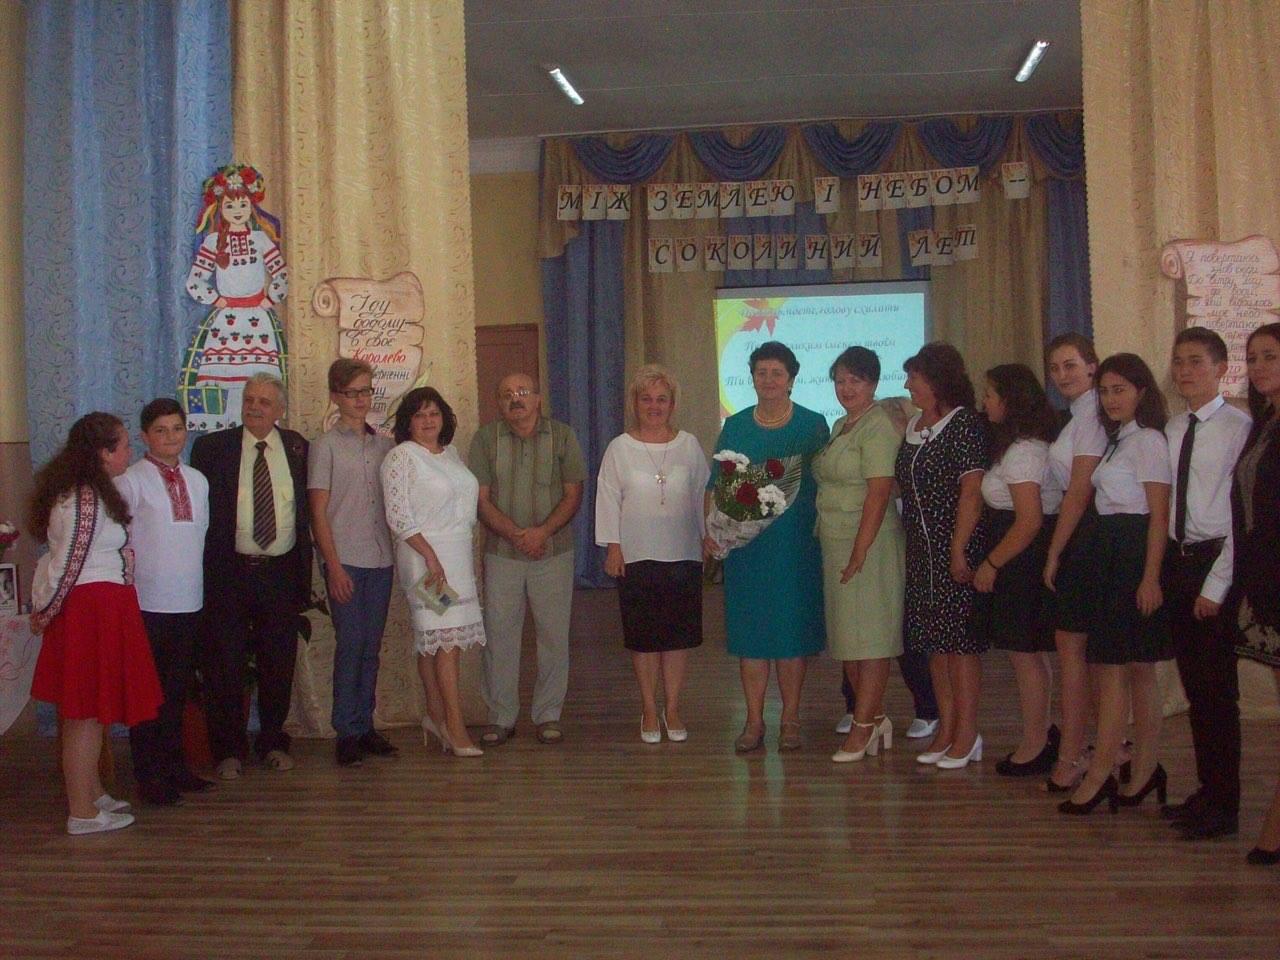 Василь Густі, Оксана Онучак, Христина Керита